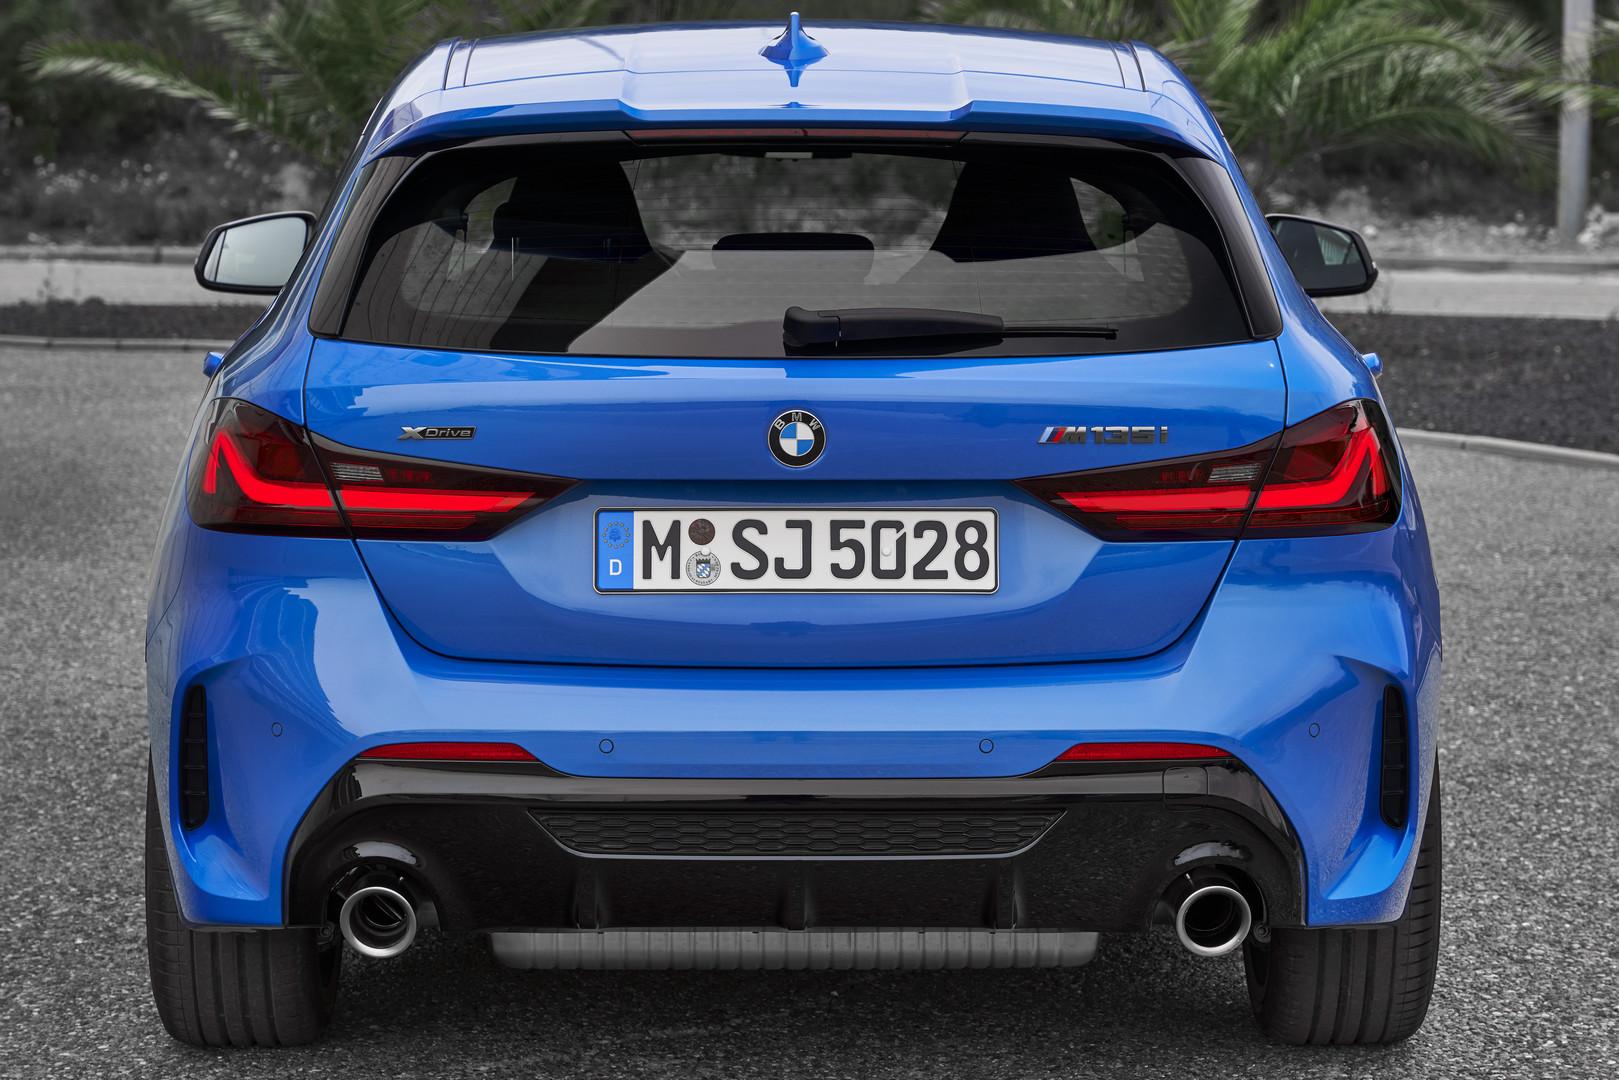 2020 BMW M135i Rear View